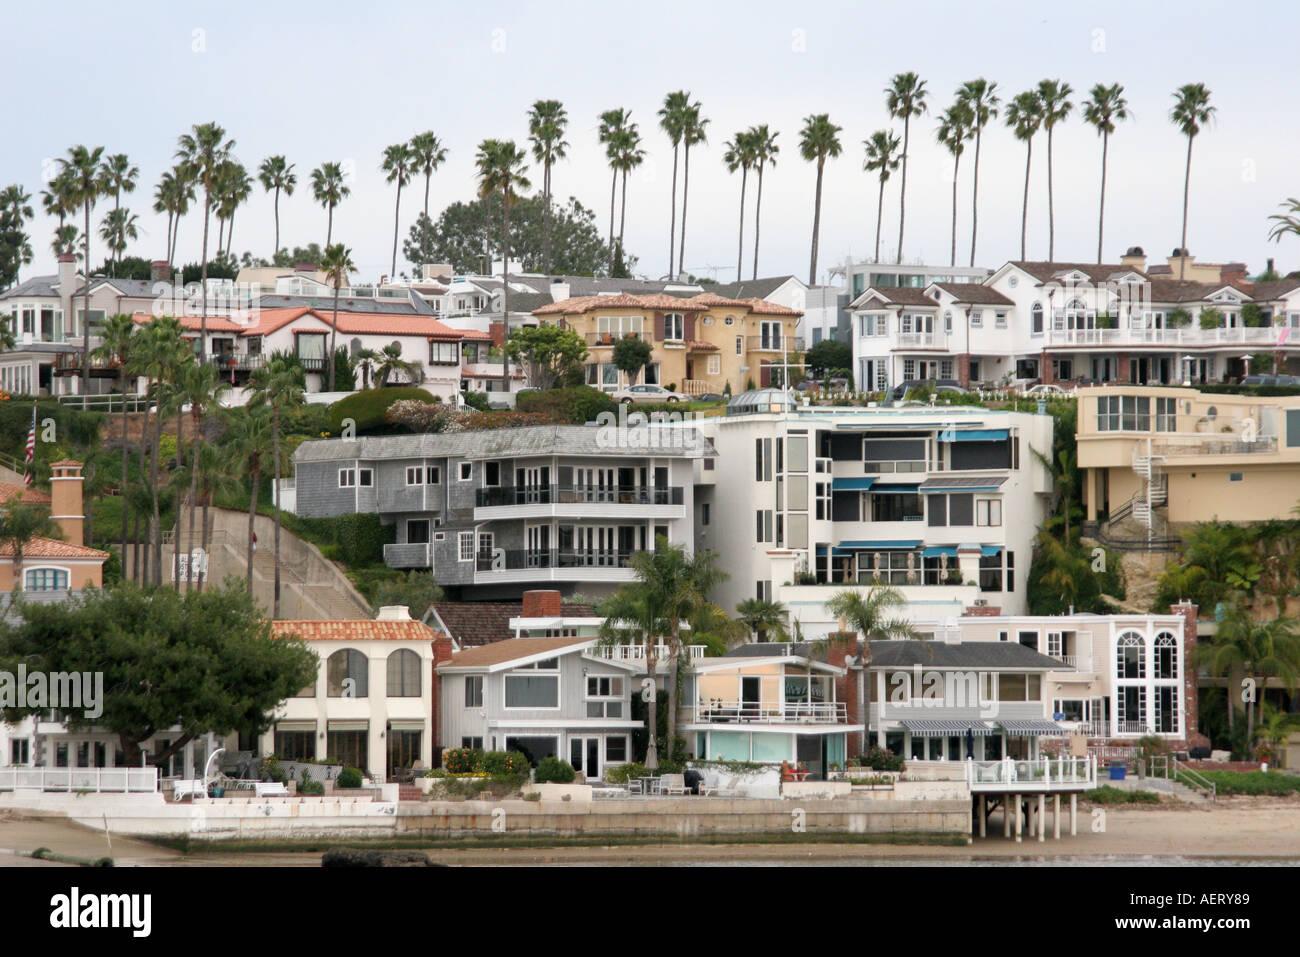 California Newport Beach Newport Bay Hillside Residences Homes Stock